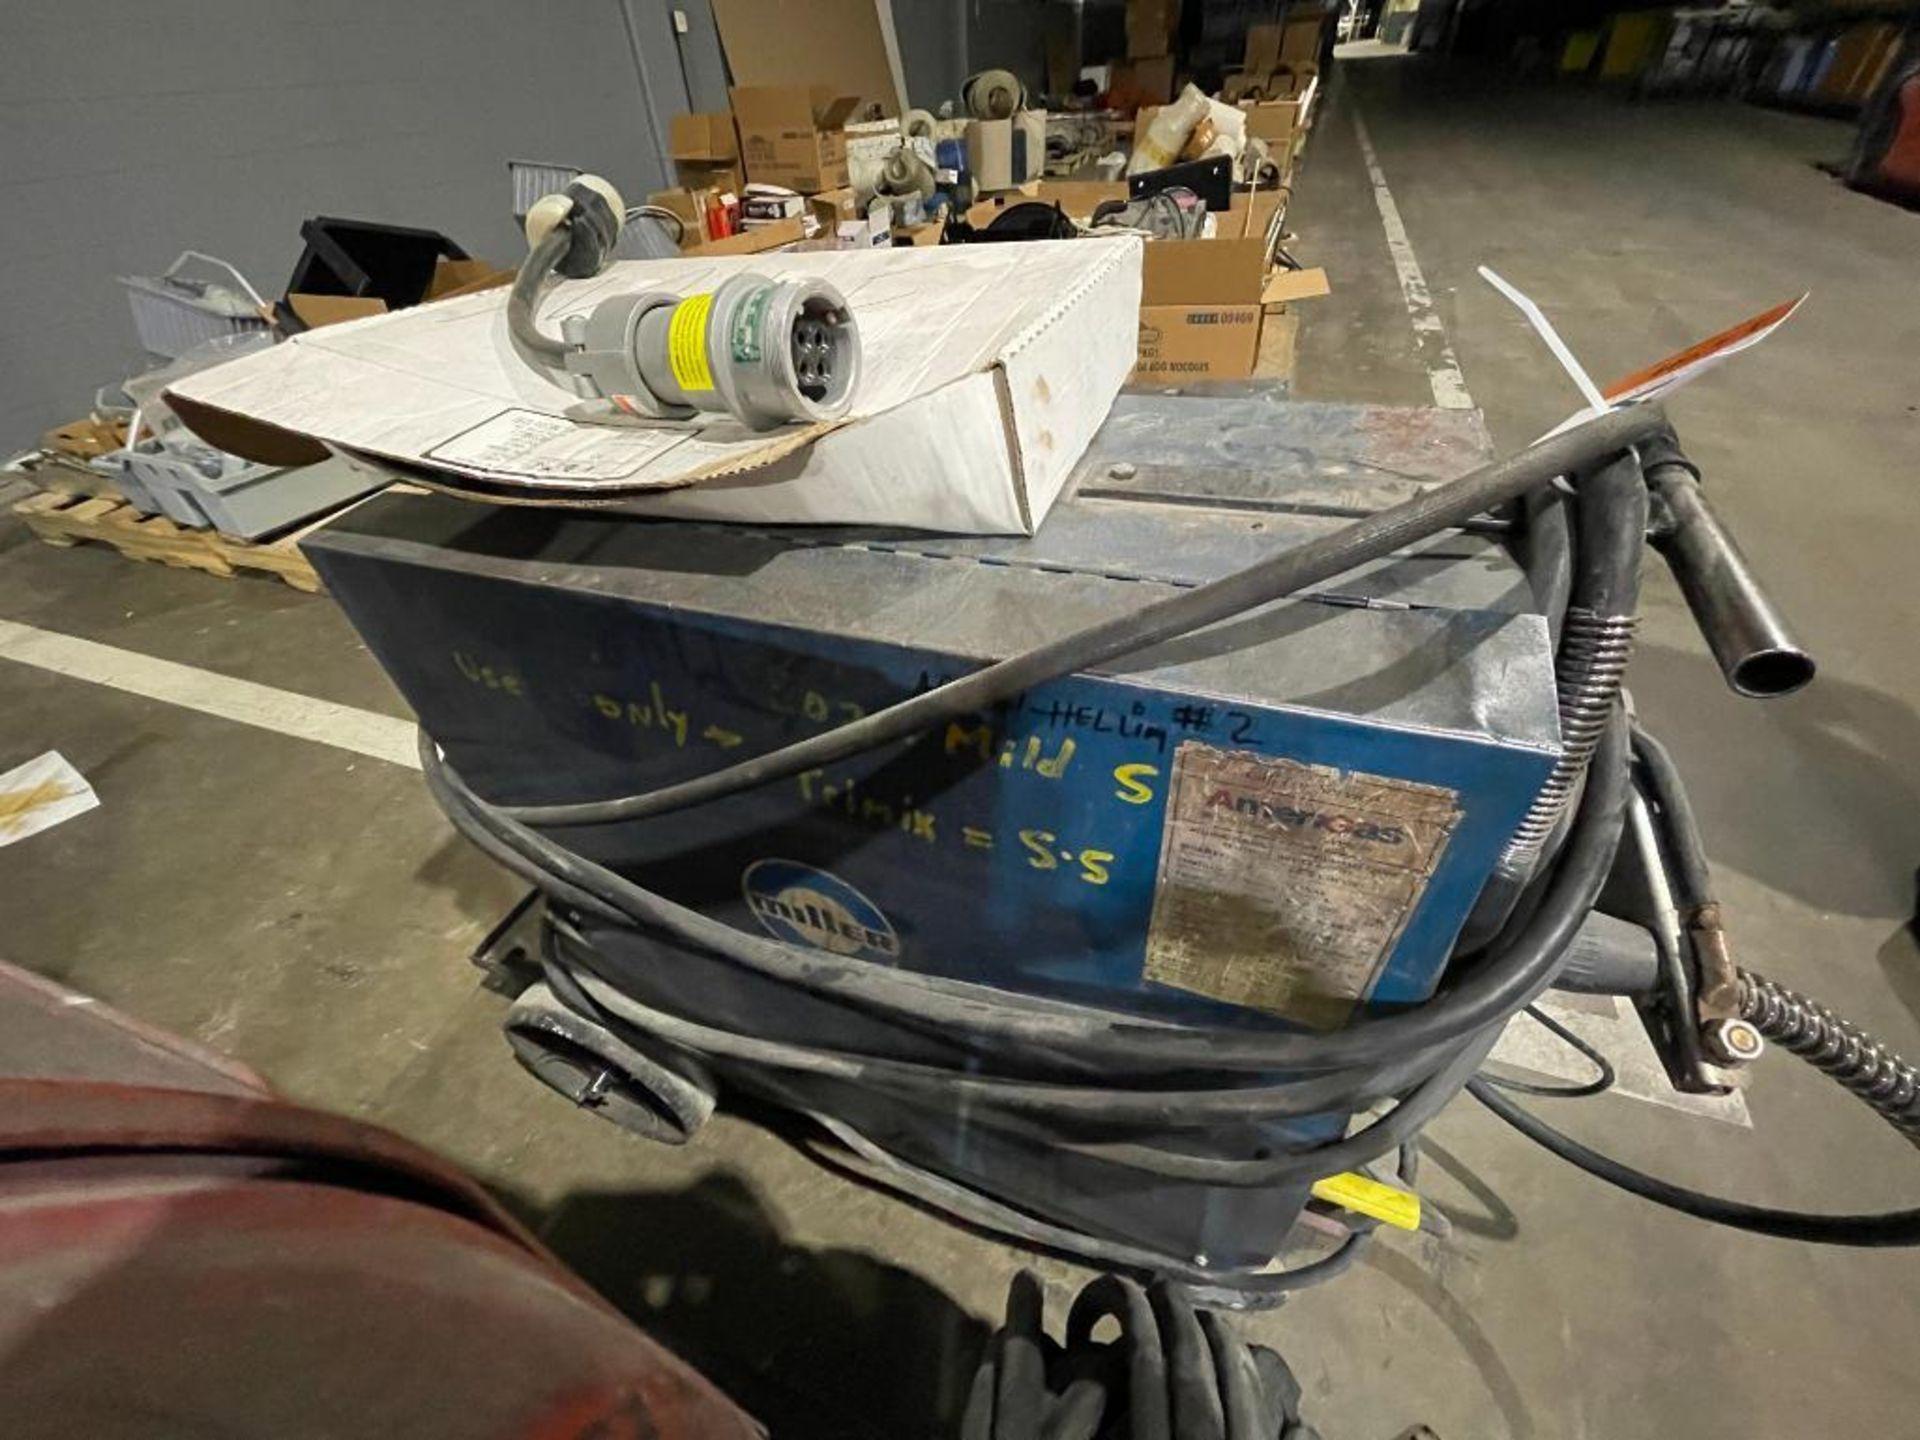 Millermatic 200 wire feed welder - Image 5 of 6